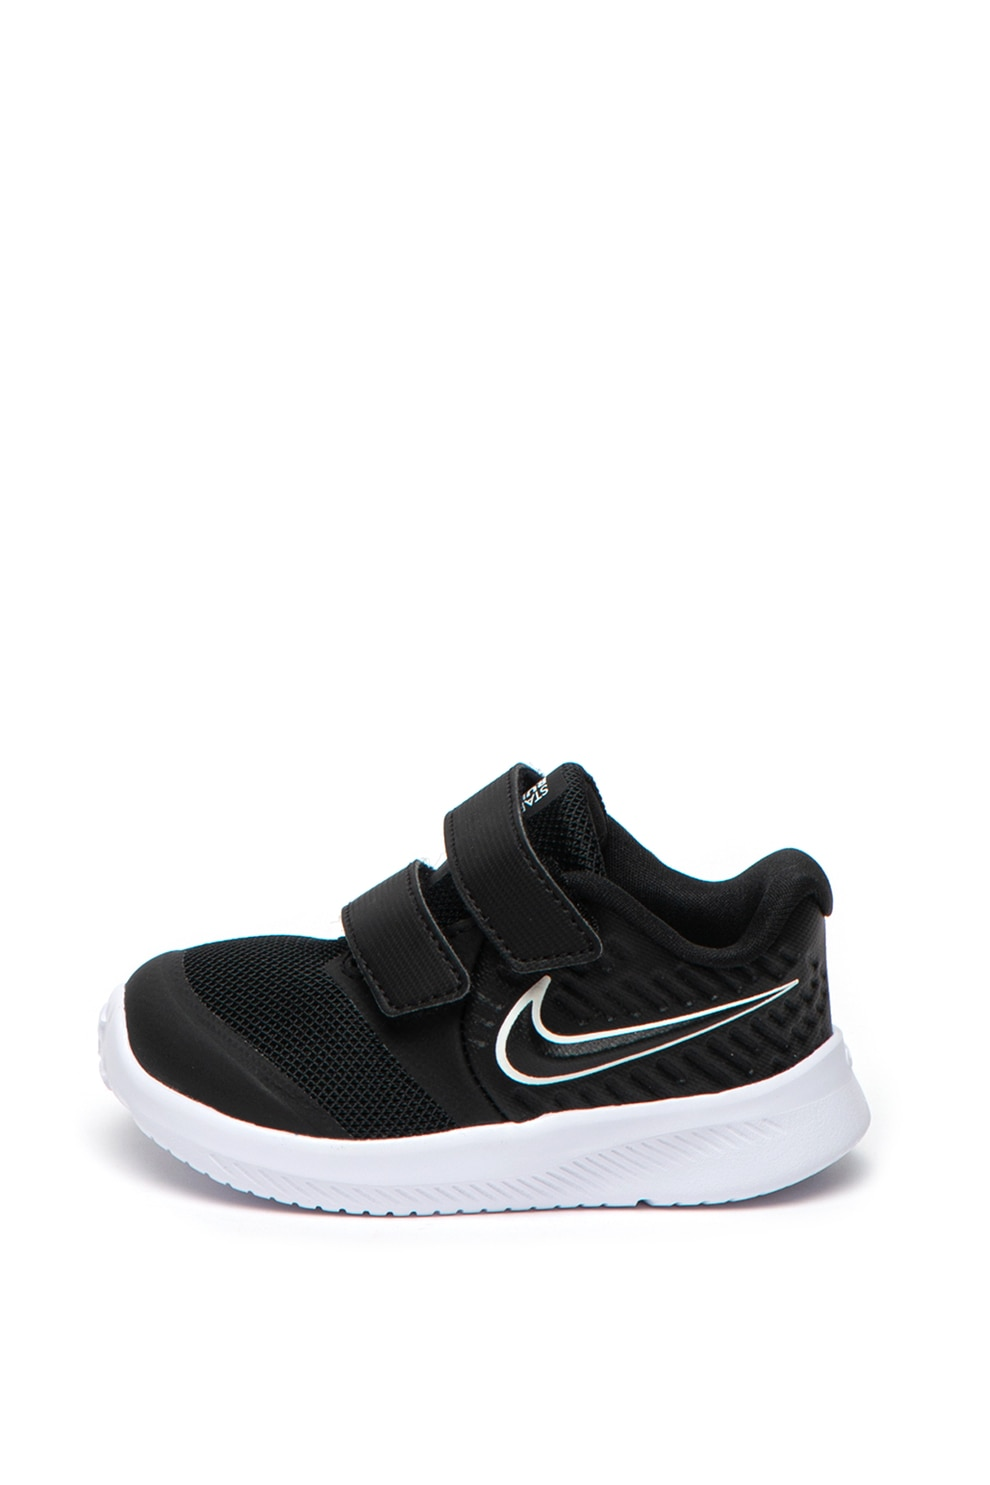 Vicio patrocinador Velas  Nike, Star Runner 2 sneaker tépőzáras pántokkal, Fekete, 22 EU - eMAG.hu